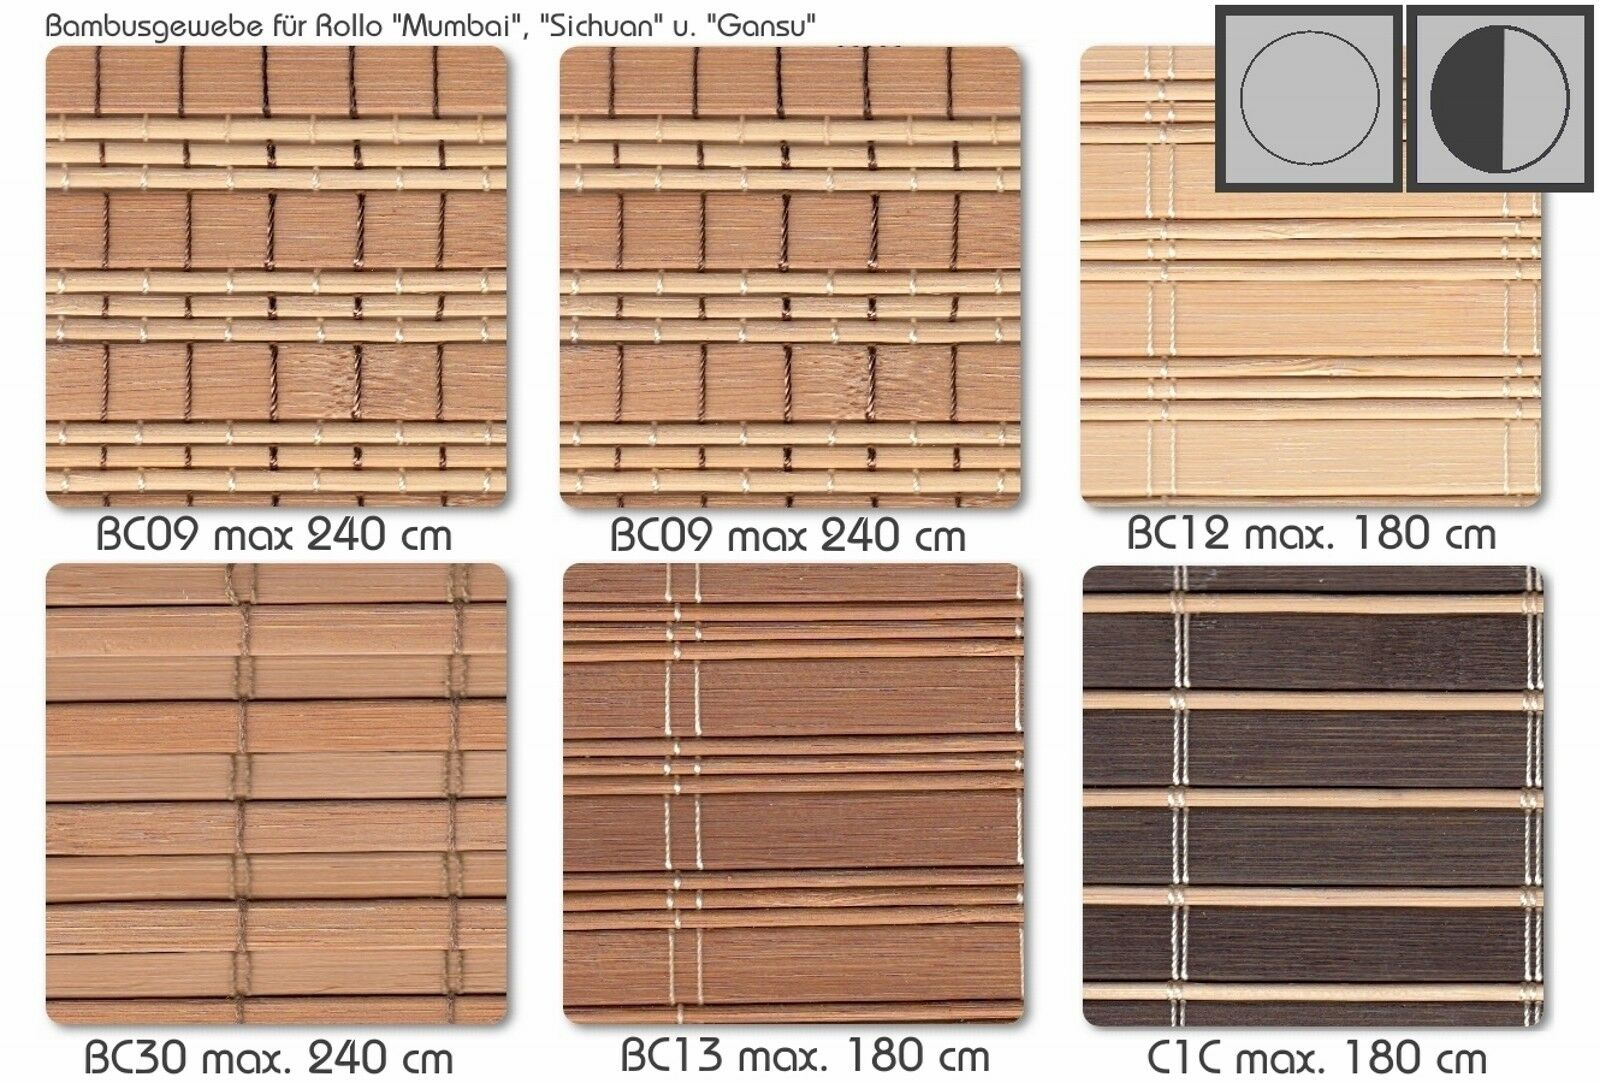 BAMBUSROLLO NRU NRU NRU Rollo mit Blende Bambus Maßanfertigung Maßrollo Holzrollo Rollup | Neuer Stil  f3bdbb